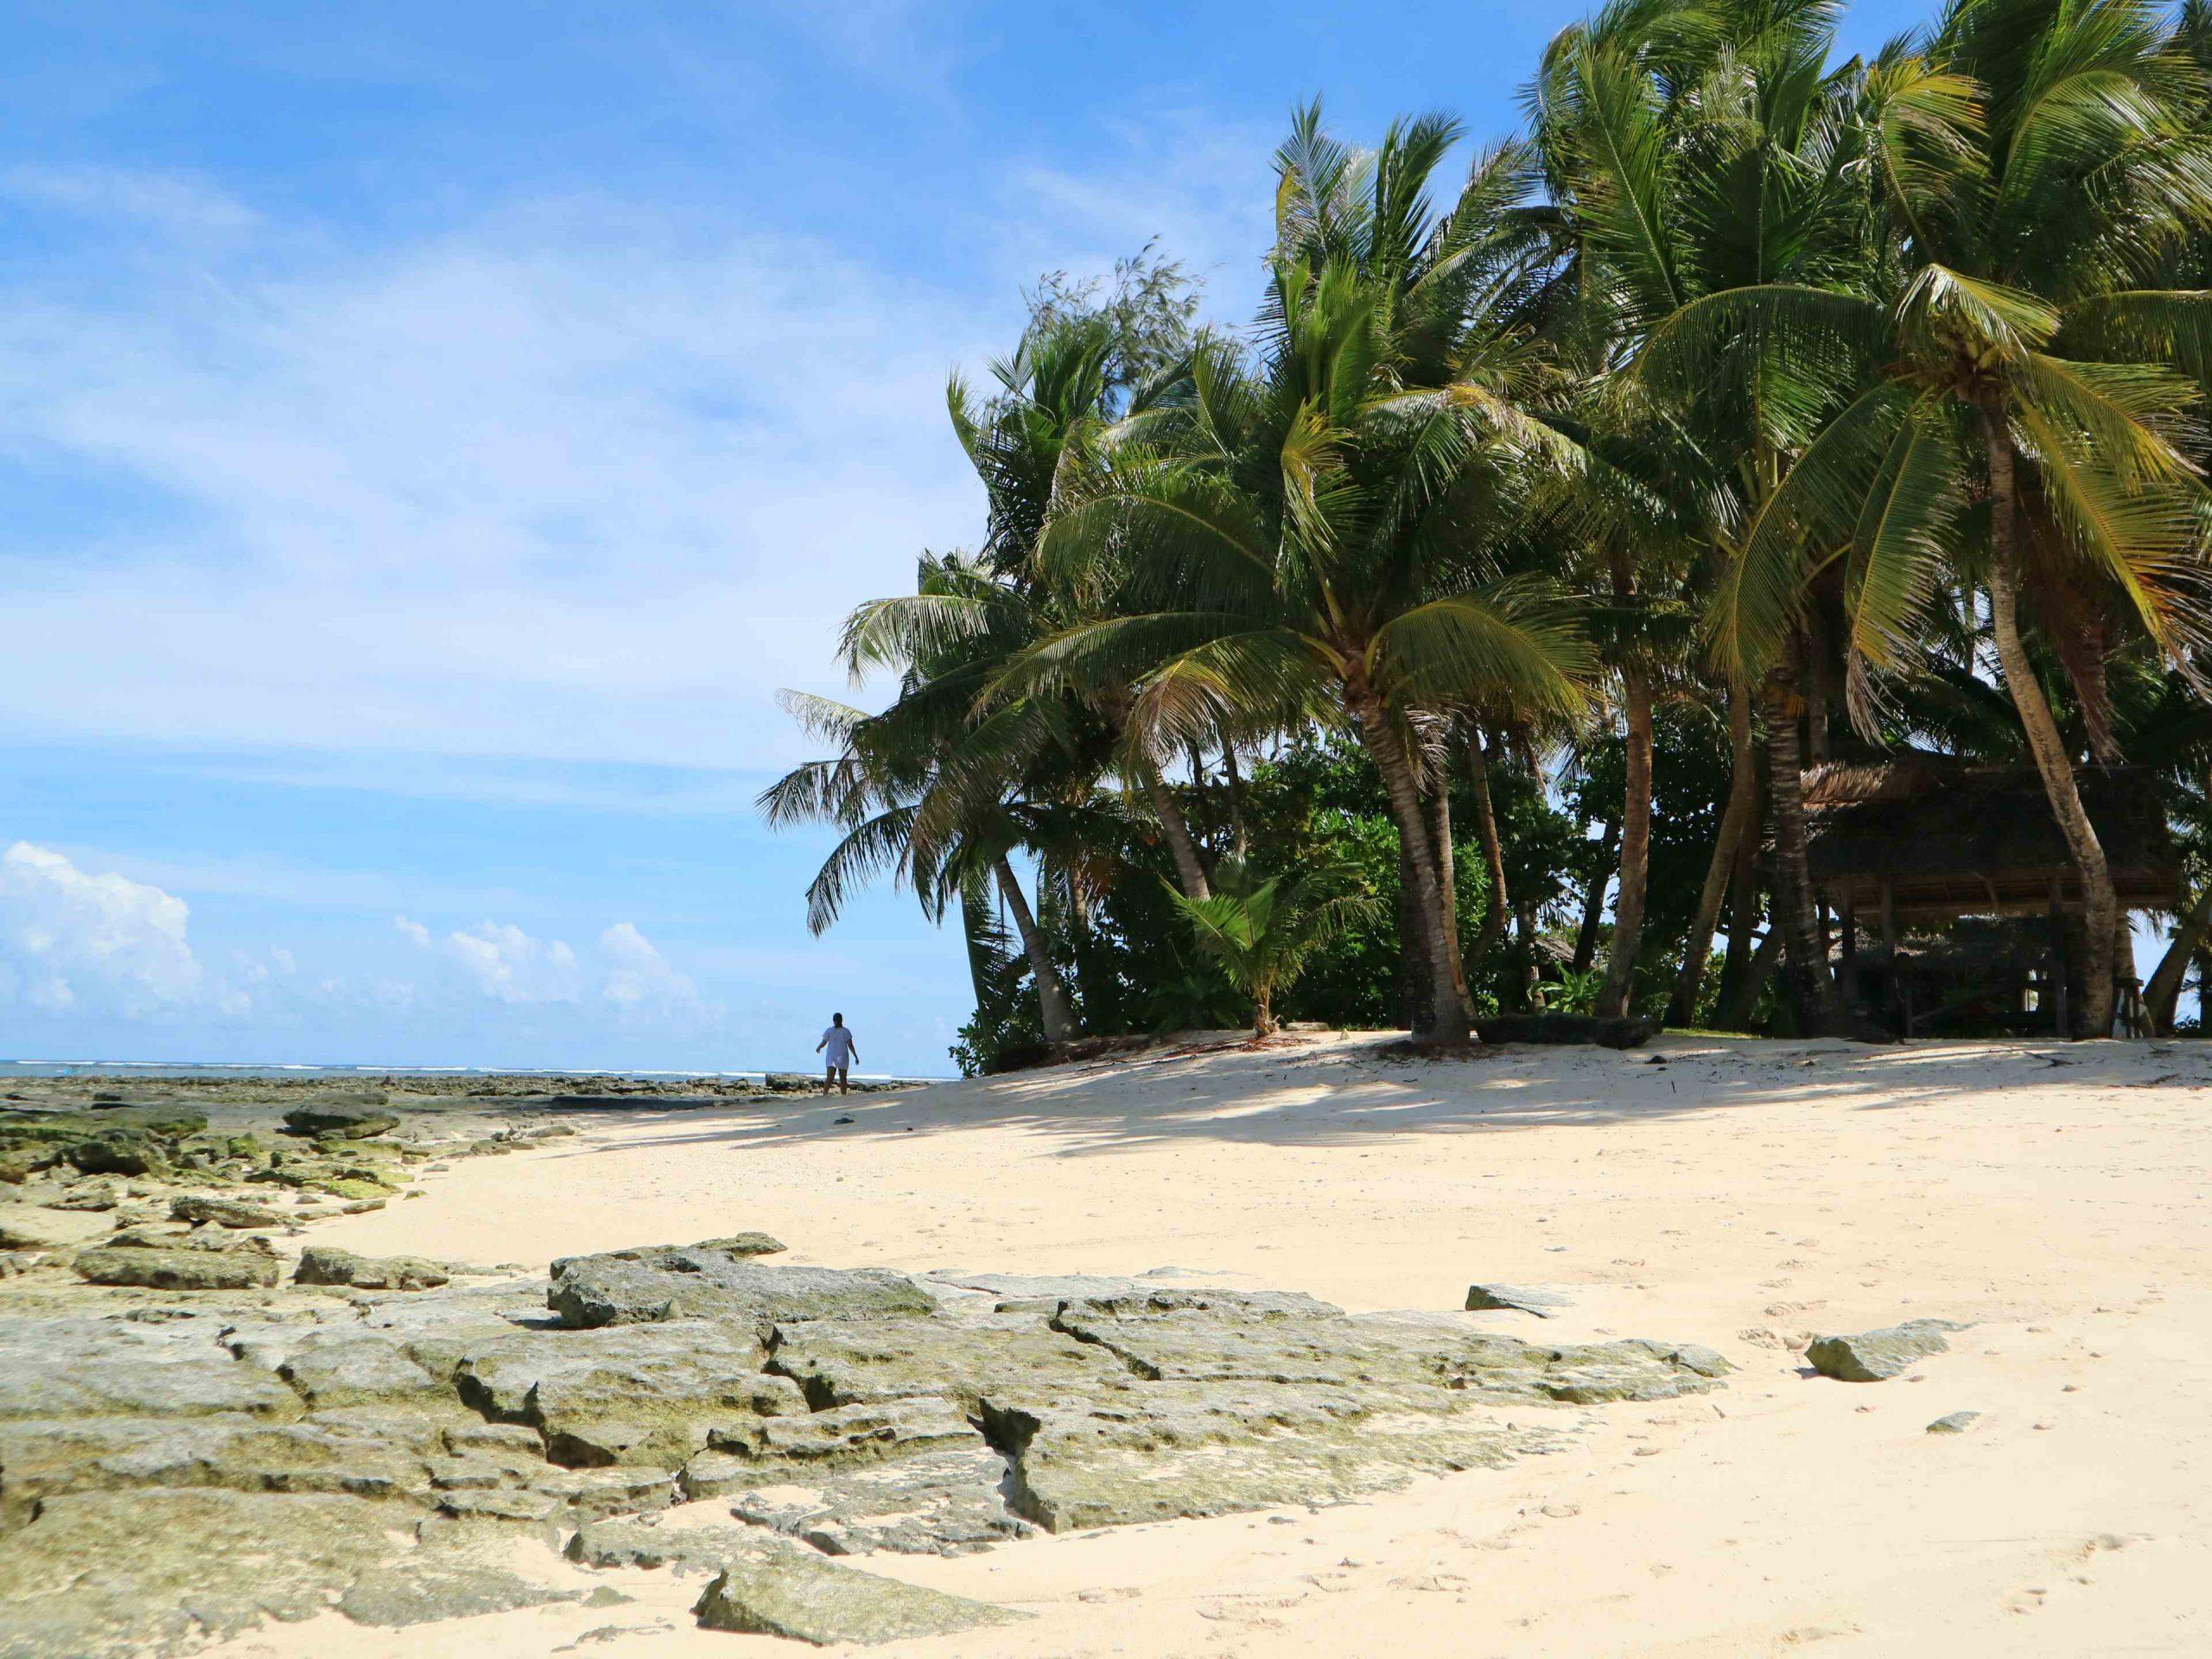 guyam-island-siargao (1)